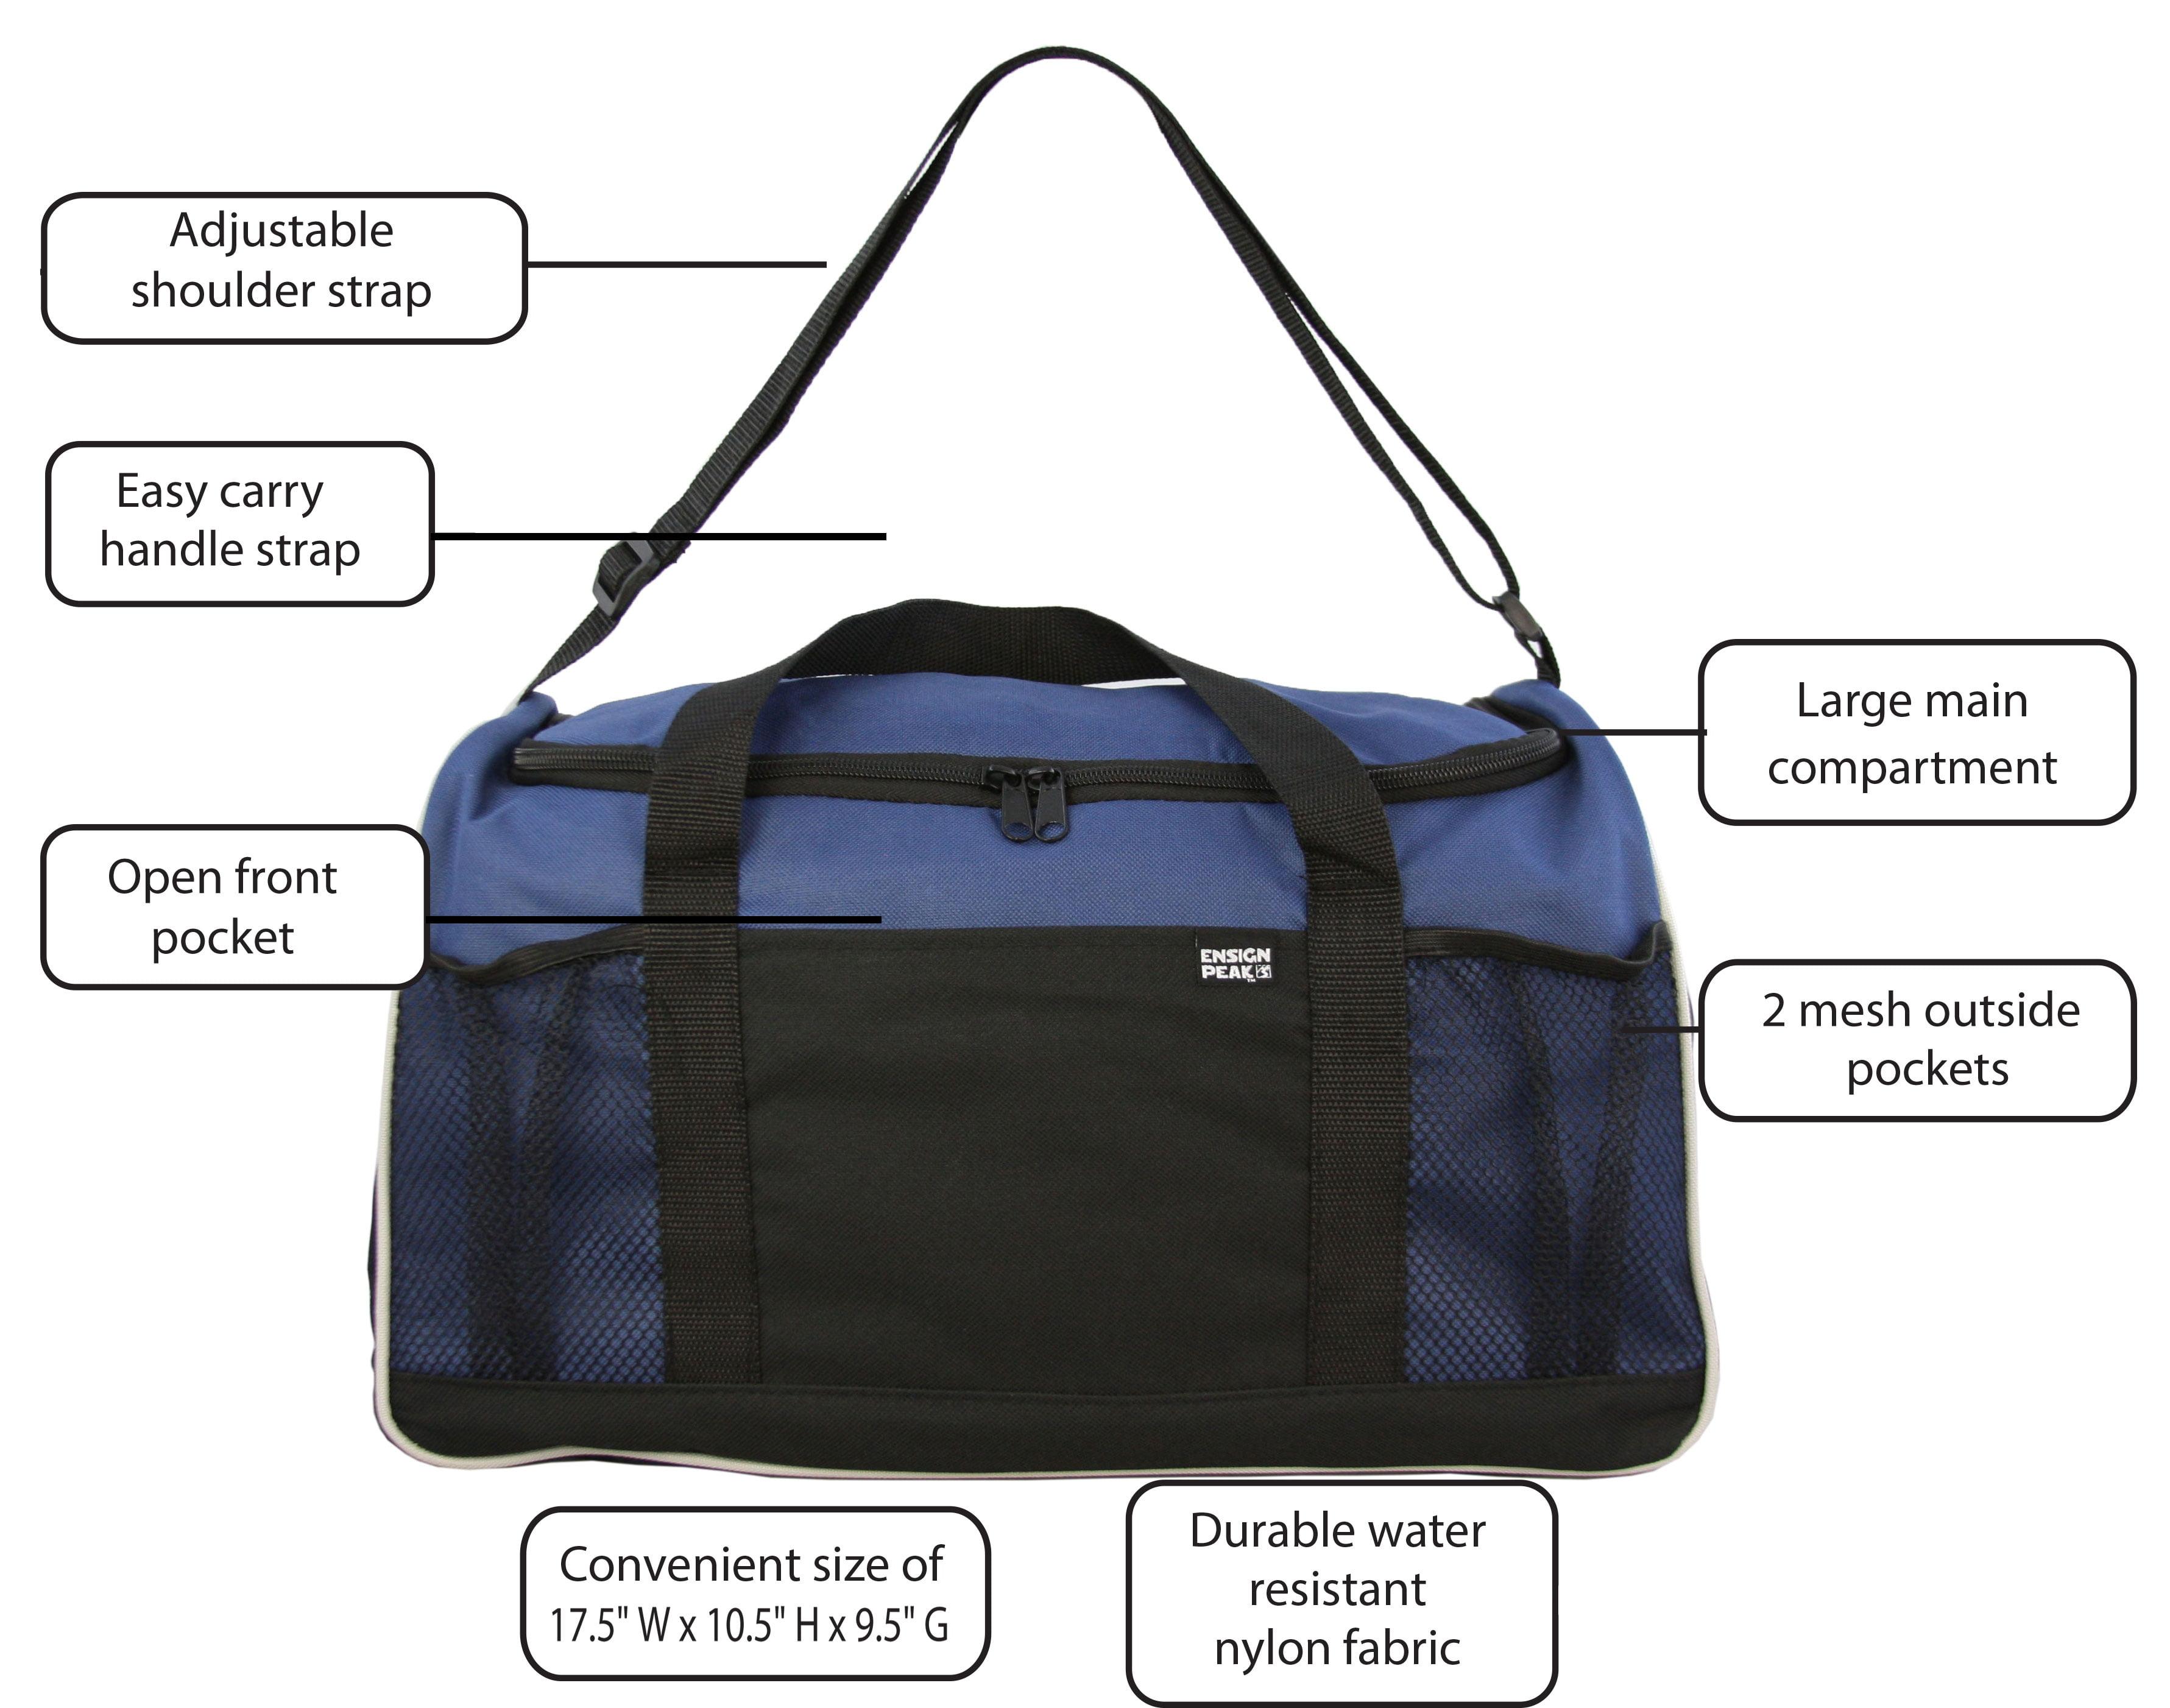 Ensign Peak Everyday Duffel Bag with Adjustable Shoulder Strap and Mesh  Pockets - Walmart.com 1358f3a34e0d6